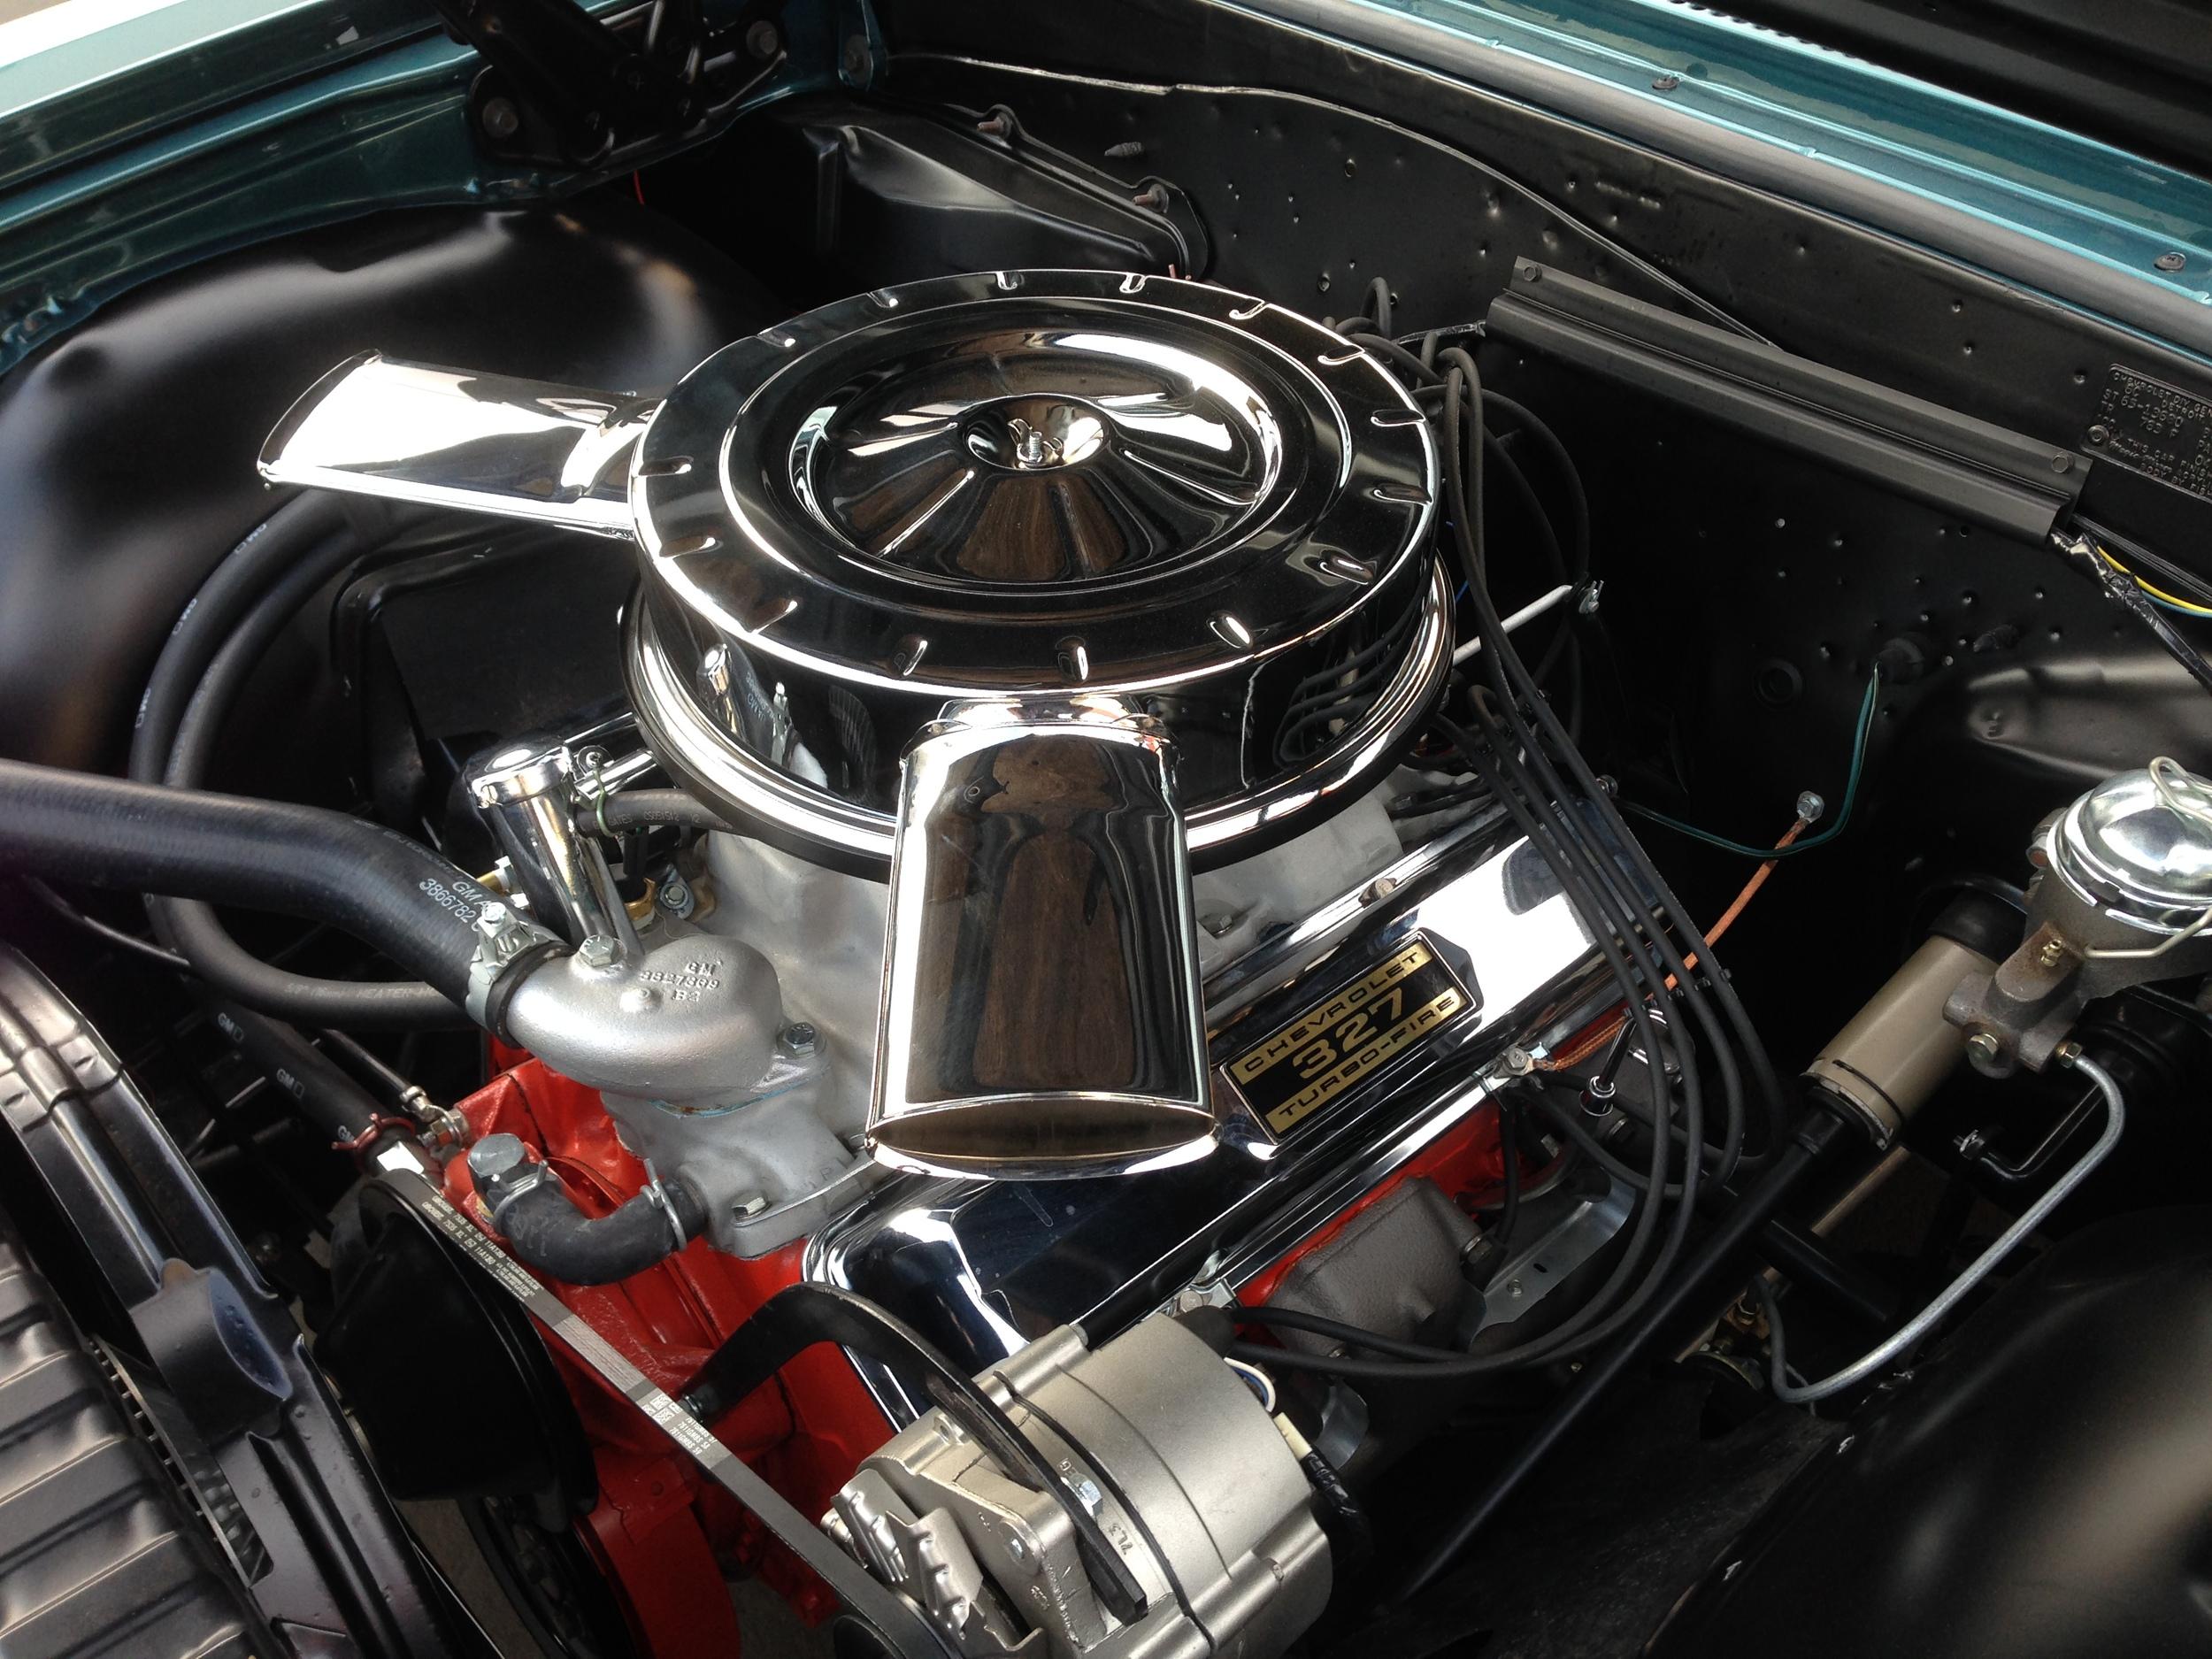 350 Horse 327 corvette motor, numbers matching.